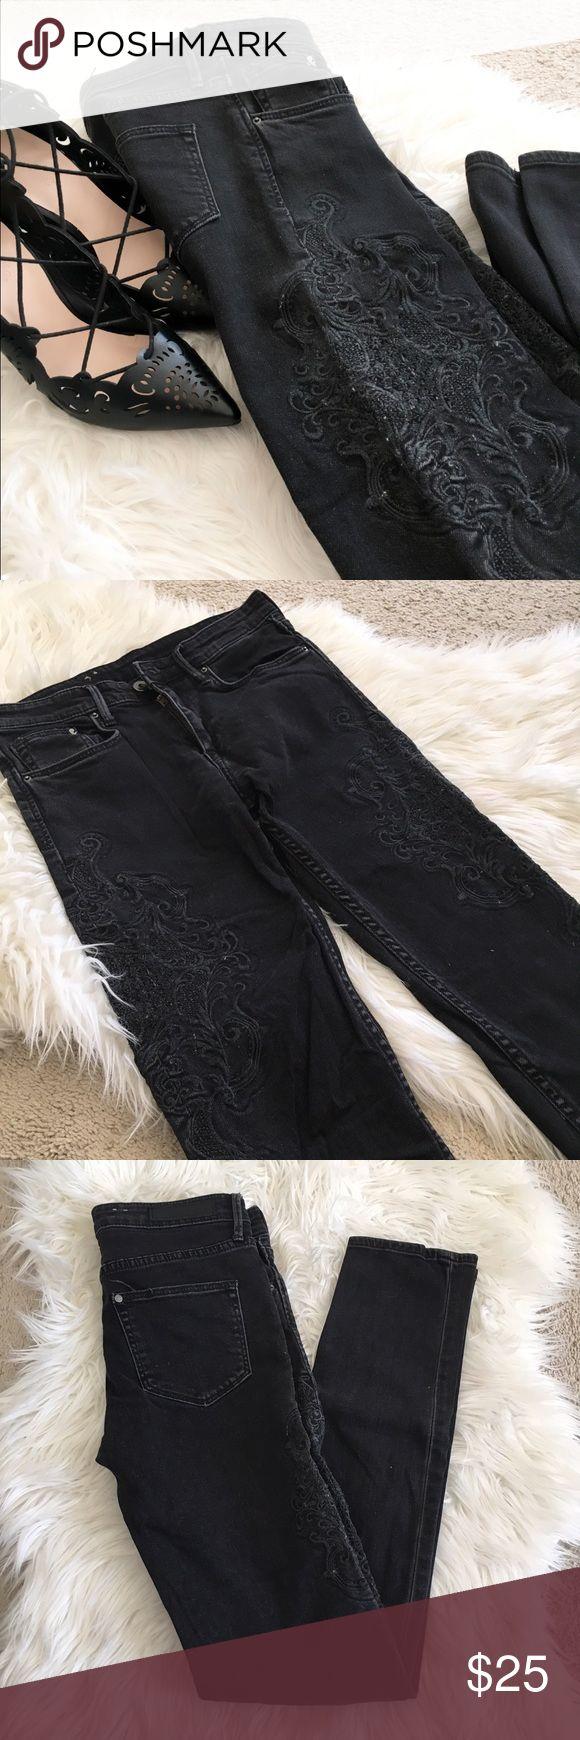 H&M black embroidered slim jeans Euc! No flaws! Slim regular dark denim jeans. Waist 25/32 98% cotton 2% elastane H&M Jeans